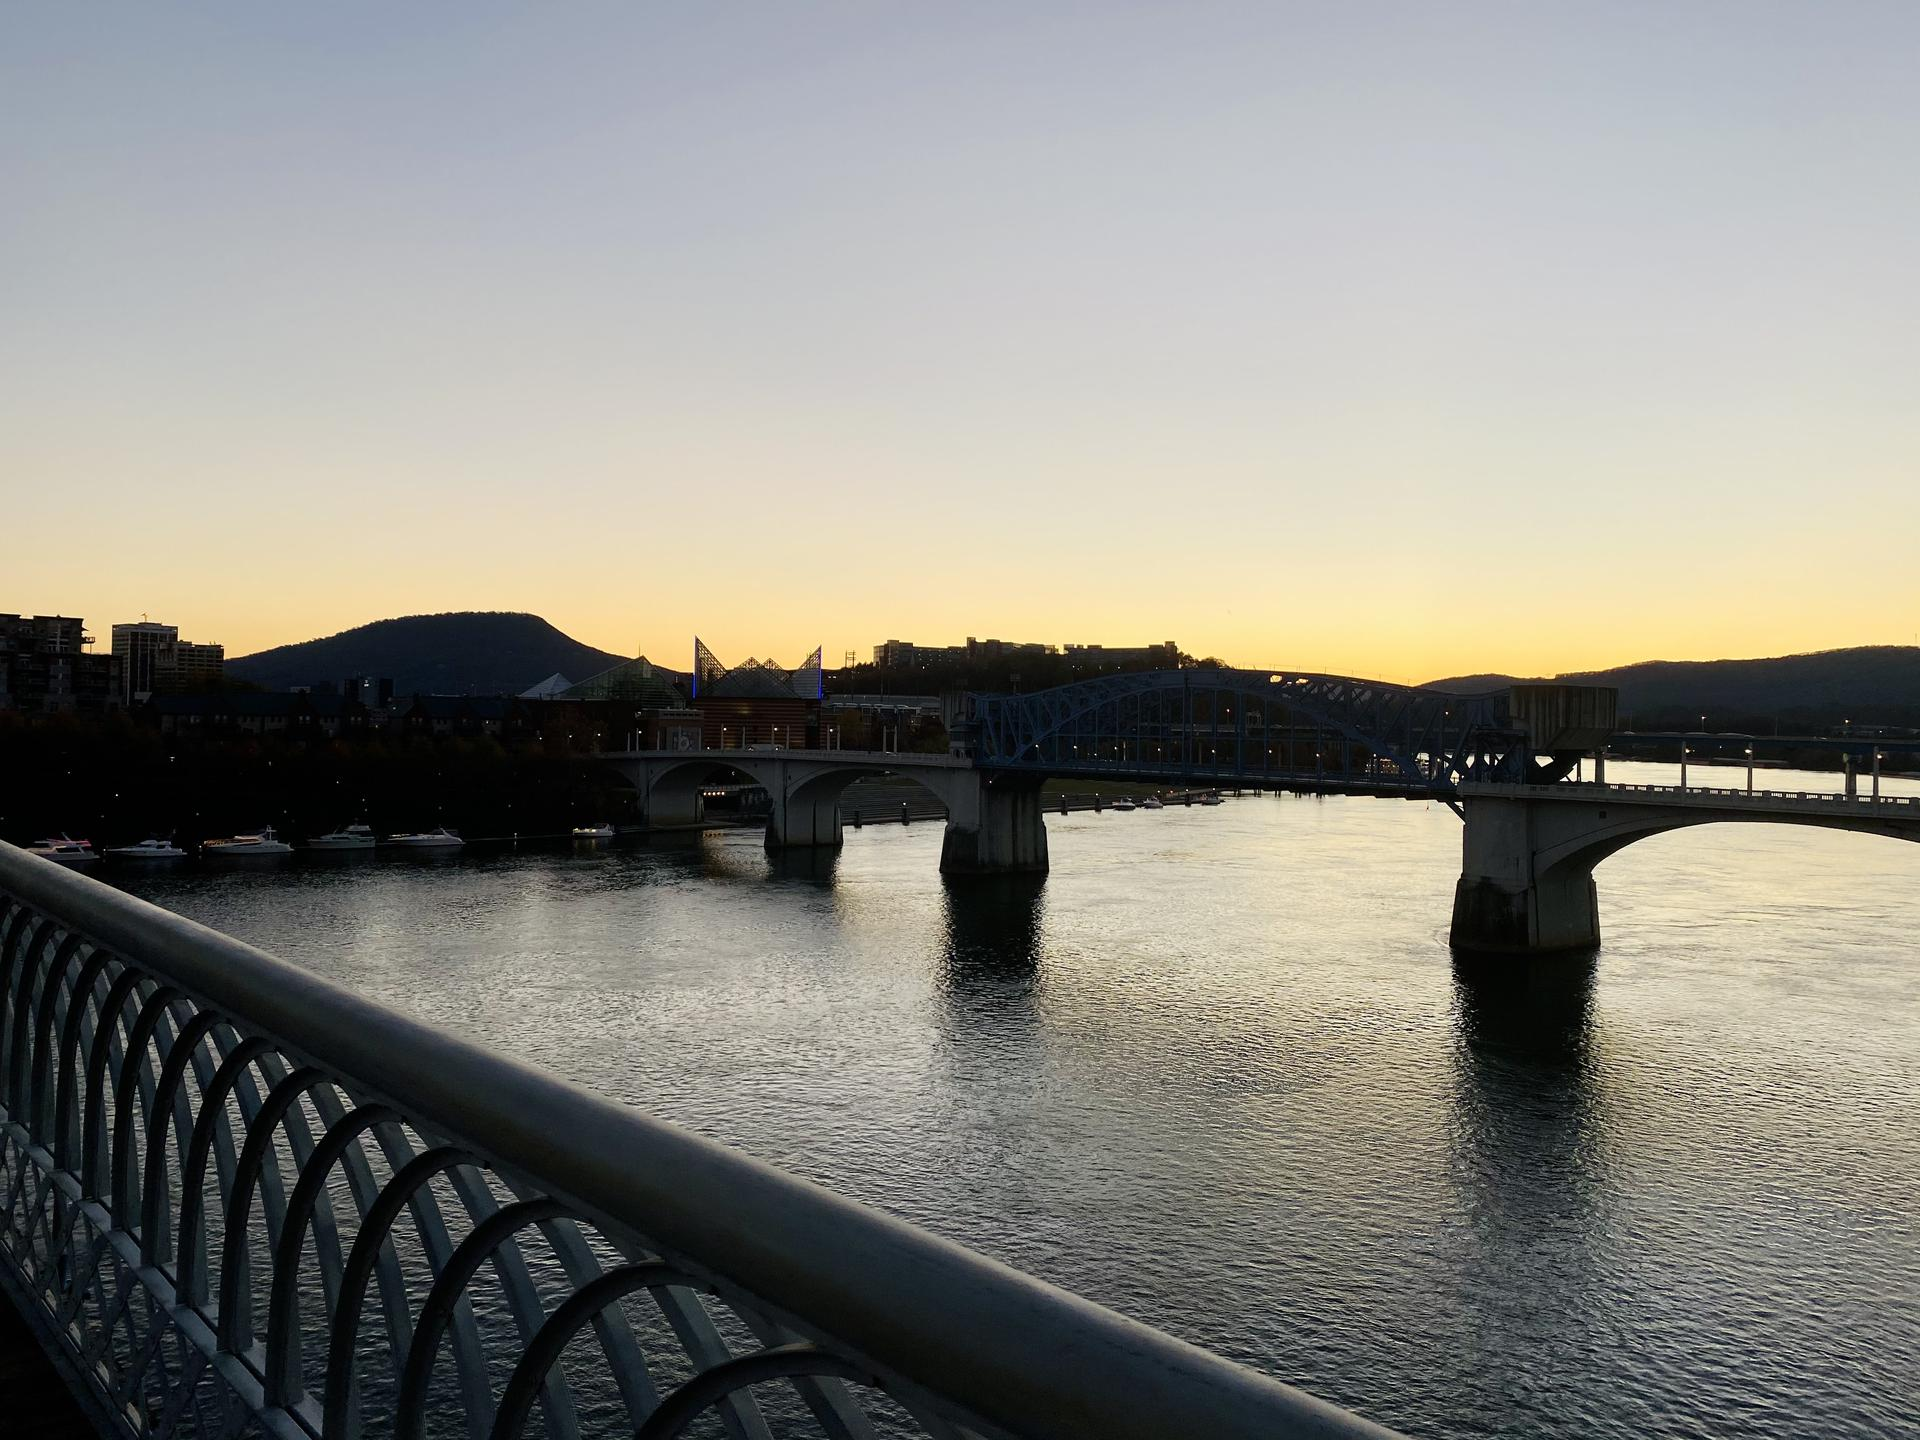 Photo of the Walnut Street Bridge at sunset